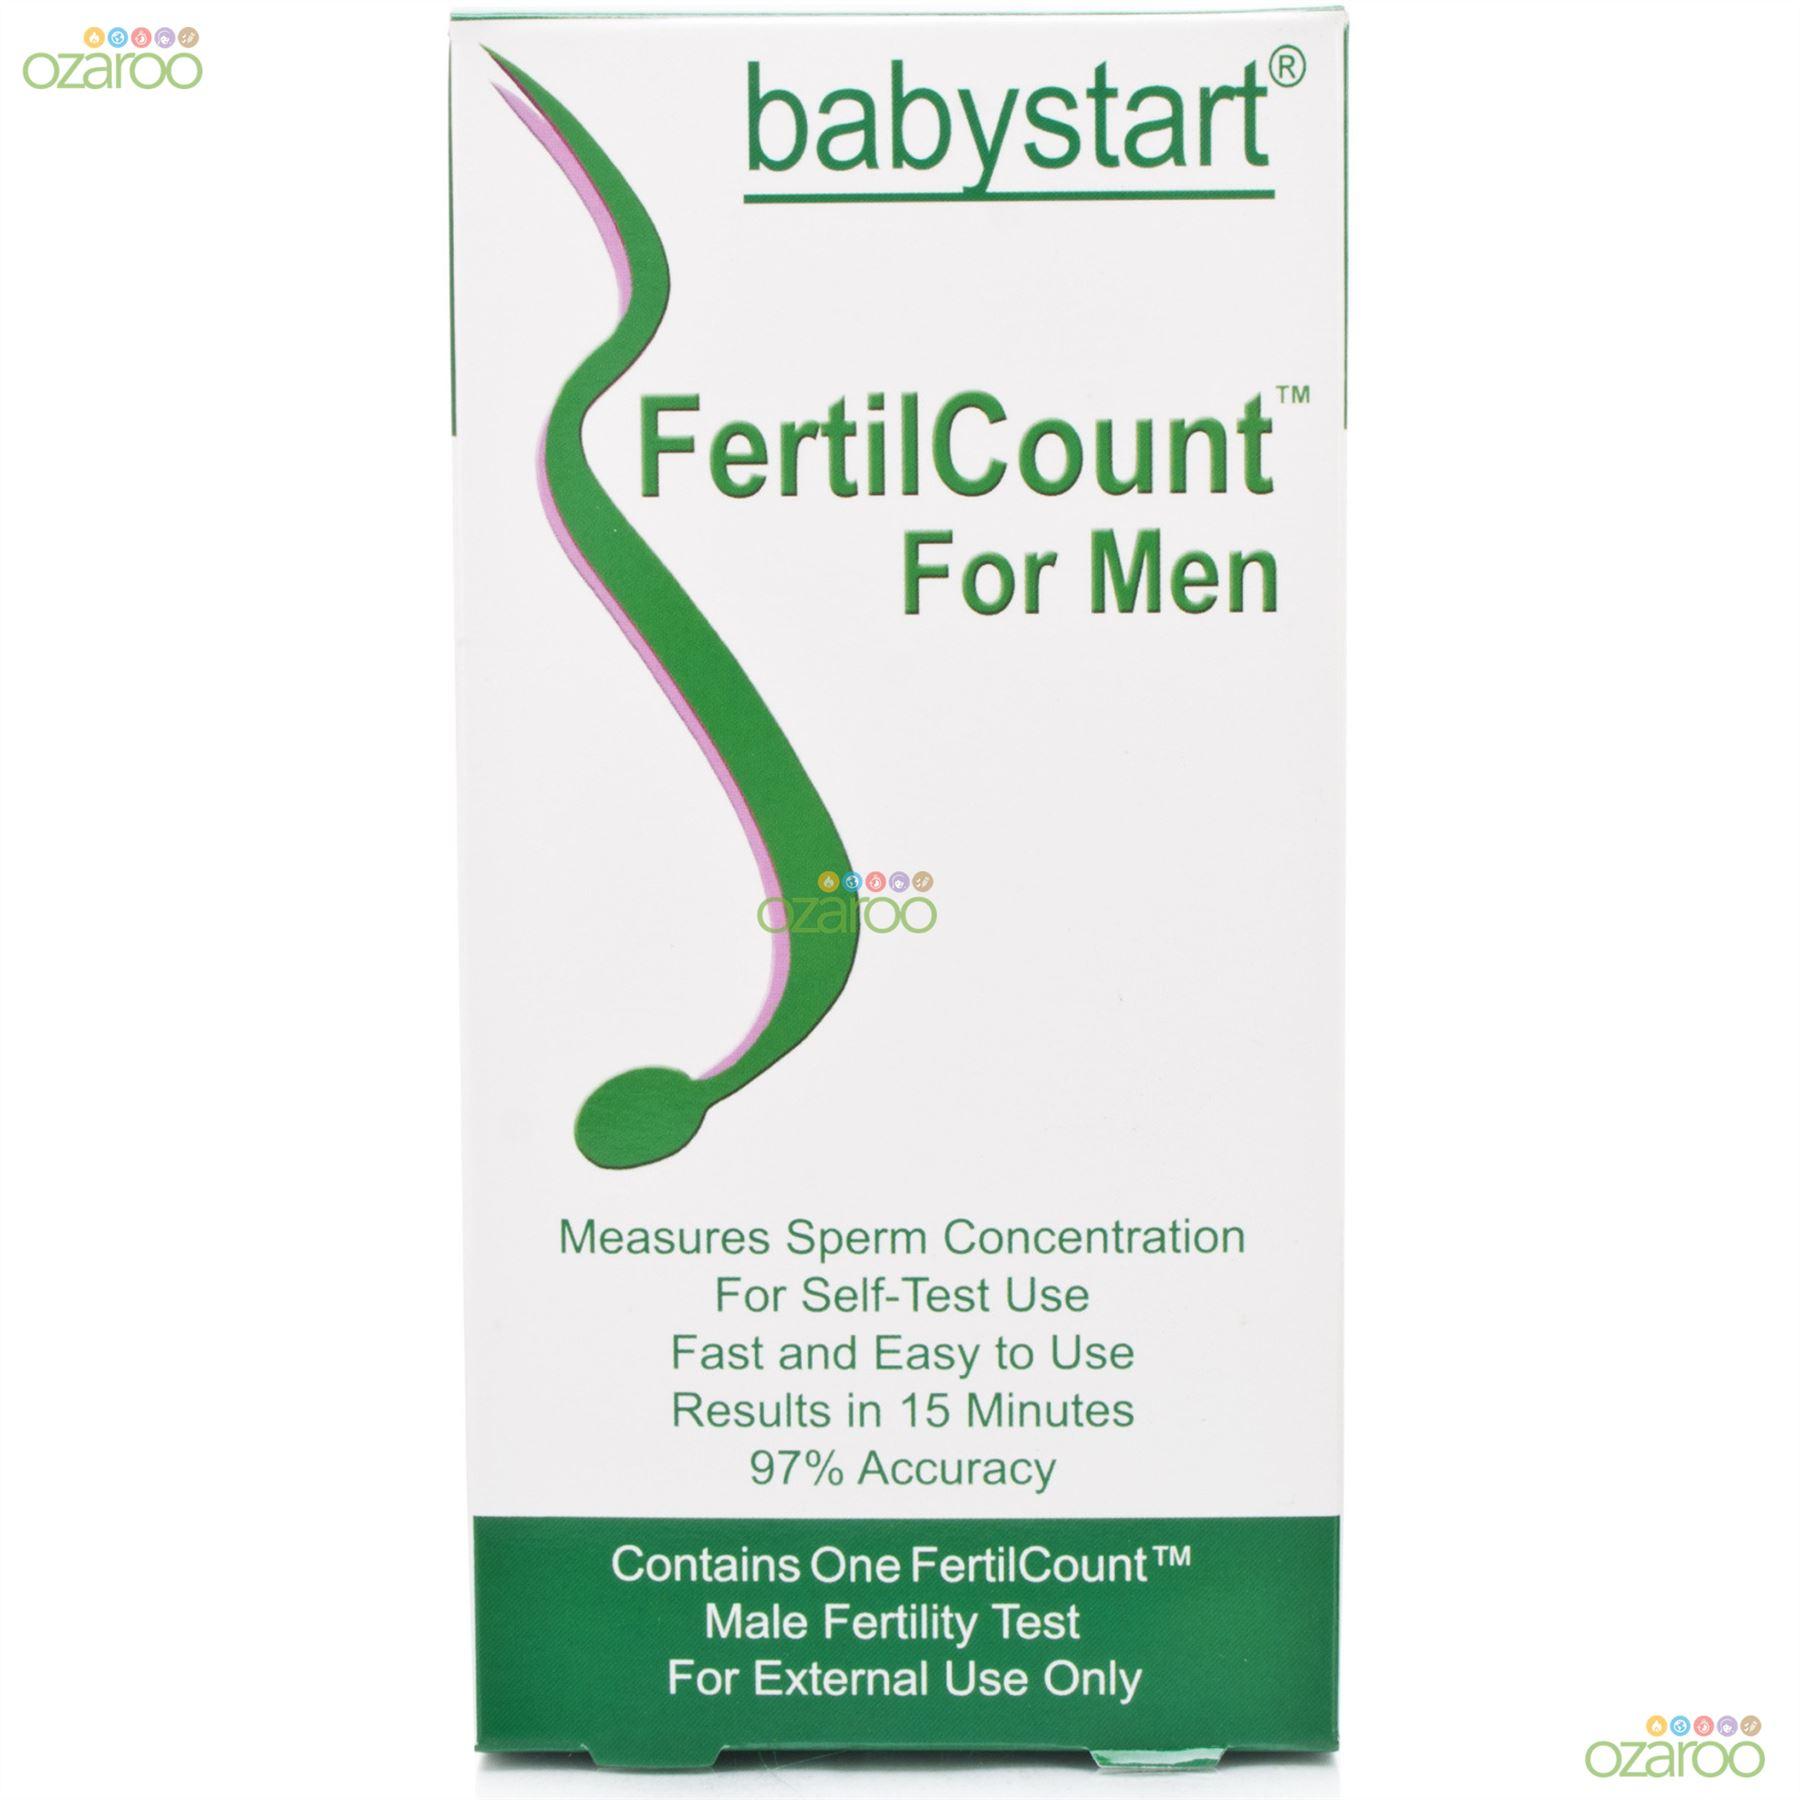 Home sperm testing kit